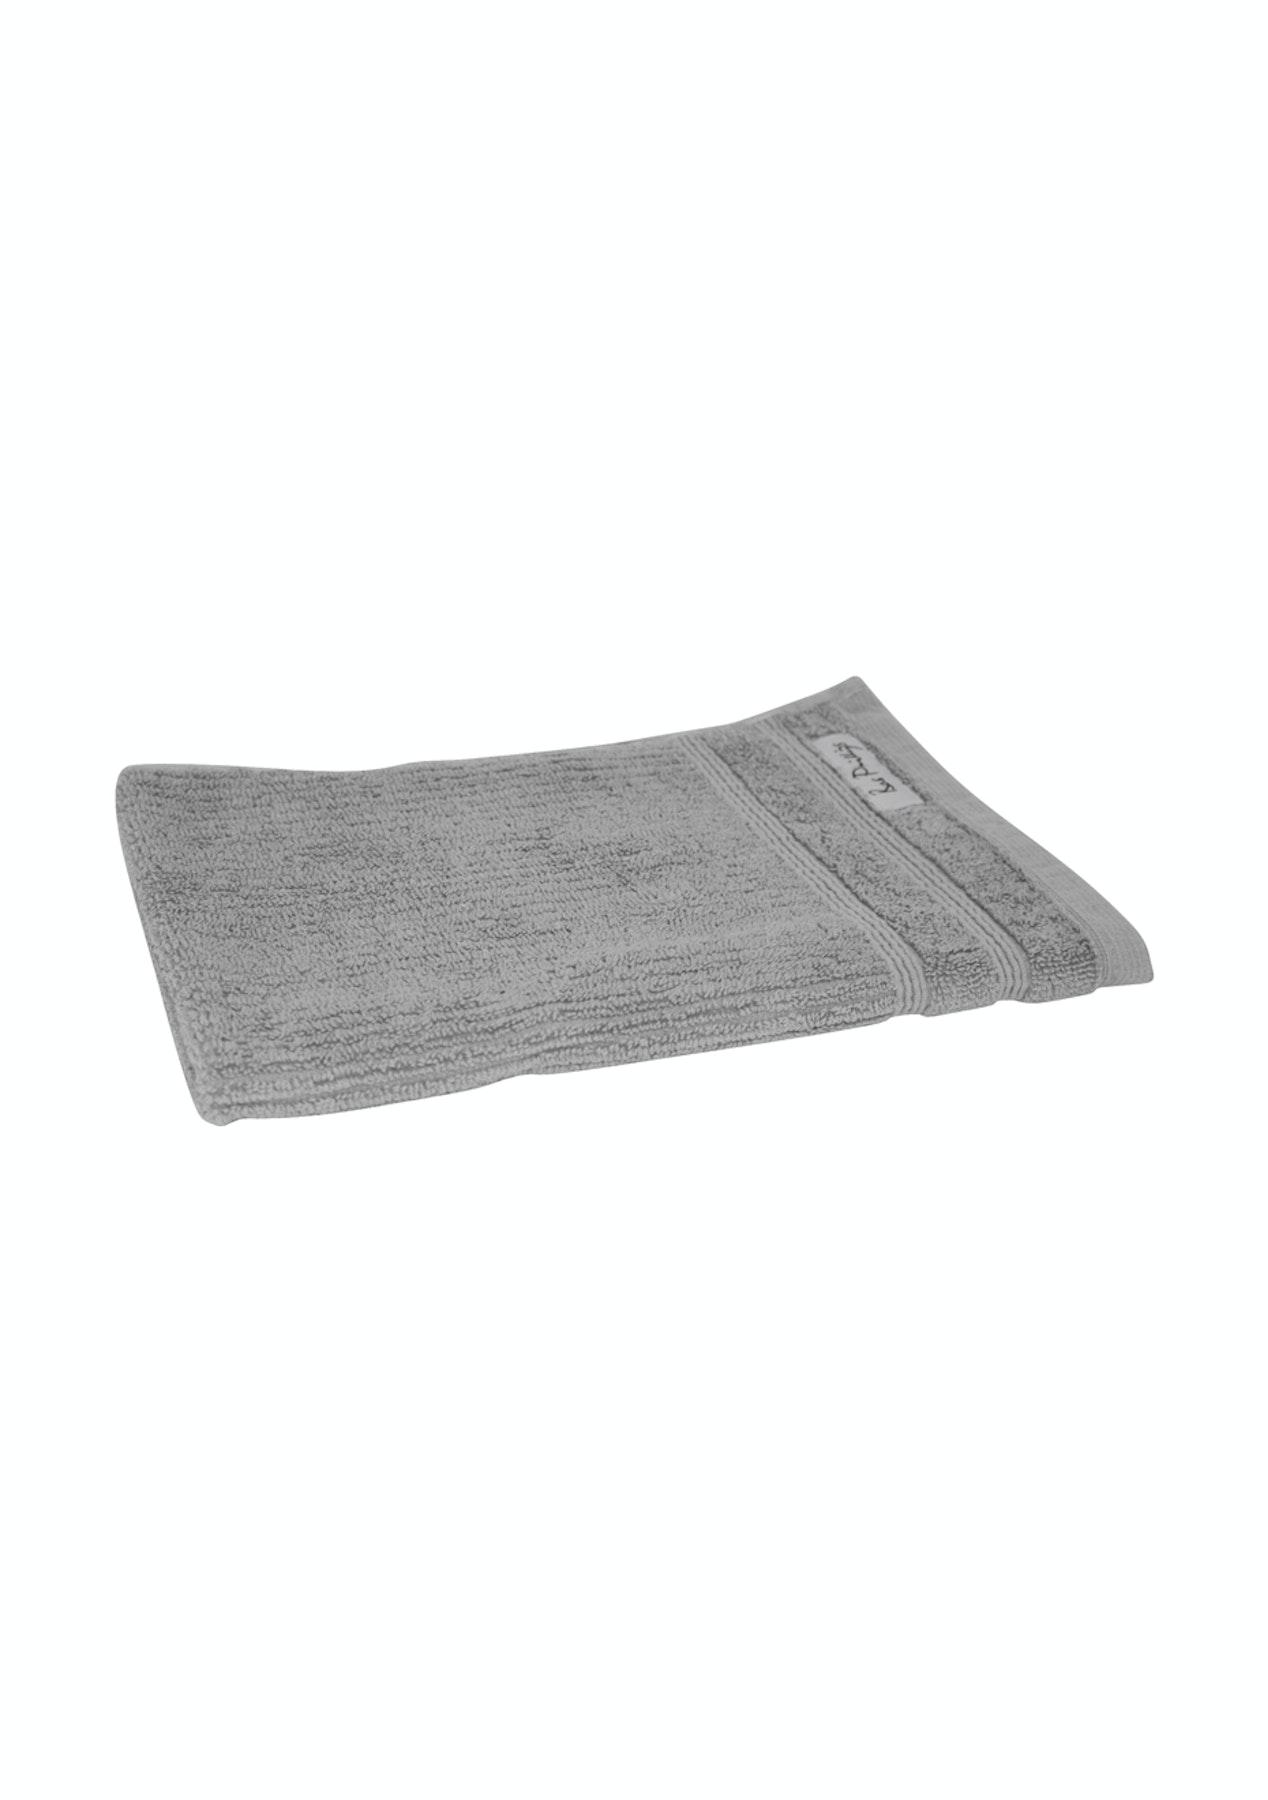 Cairo Egyptian Cotton Hand Towel - Pebble